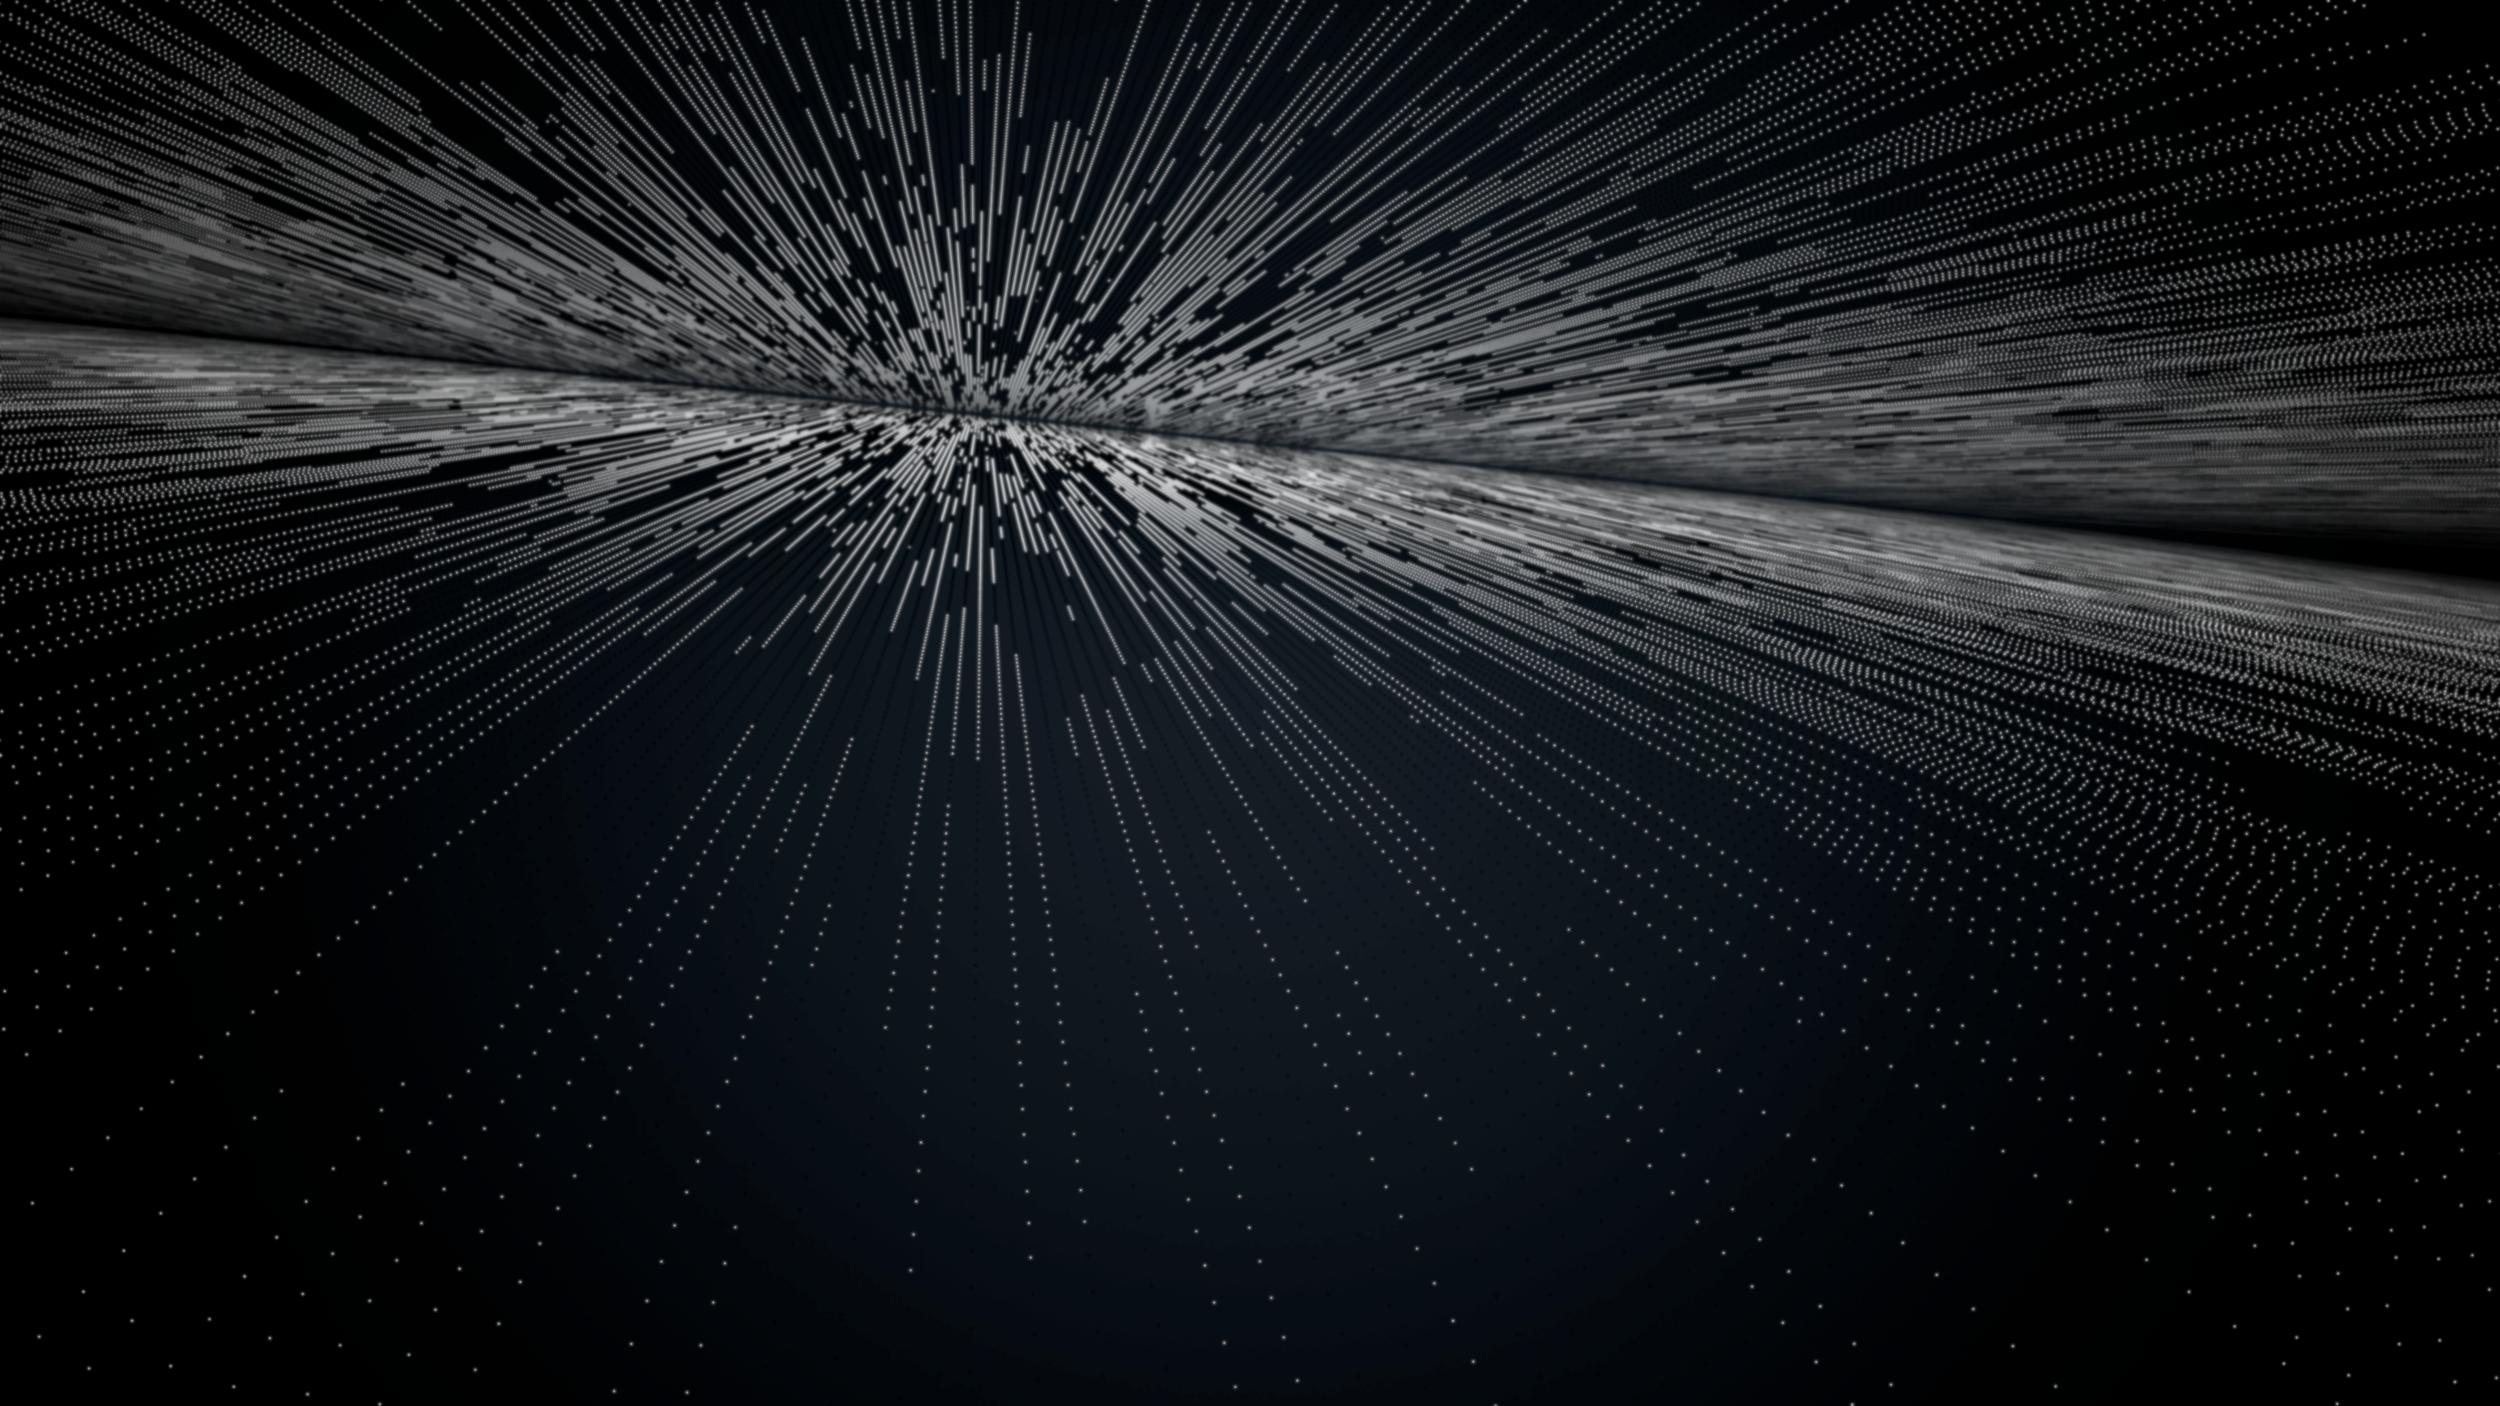 screencapture_DataCascade_Bloom.png